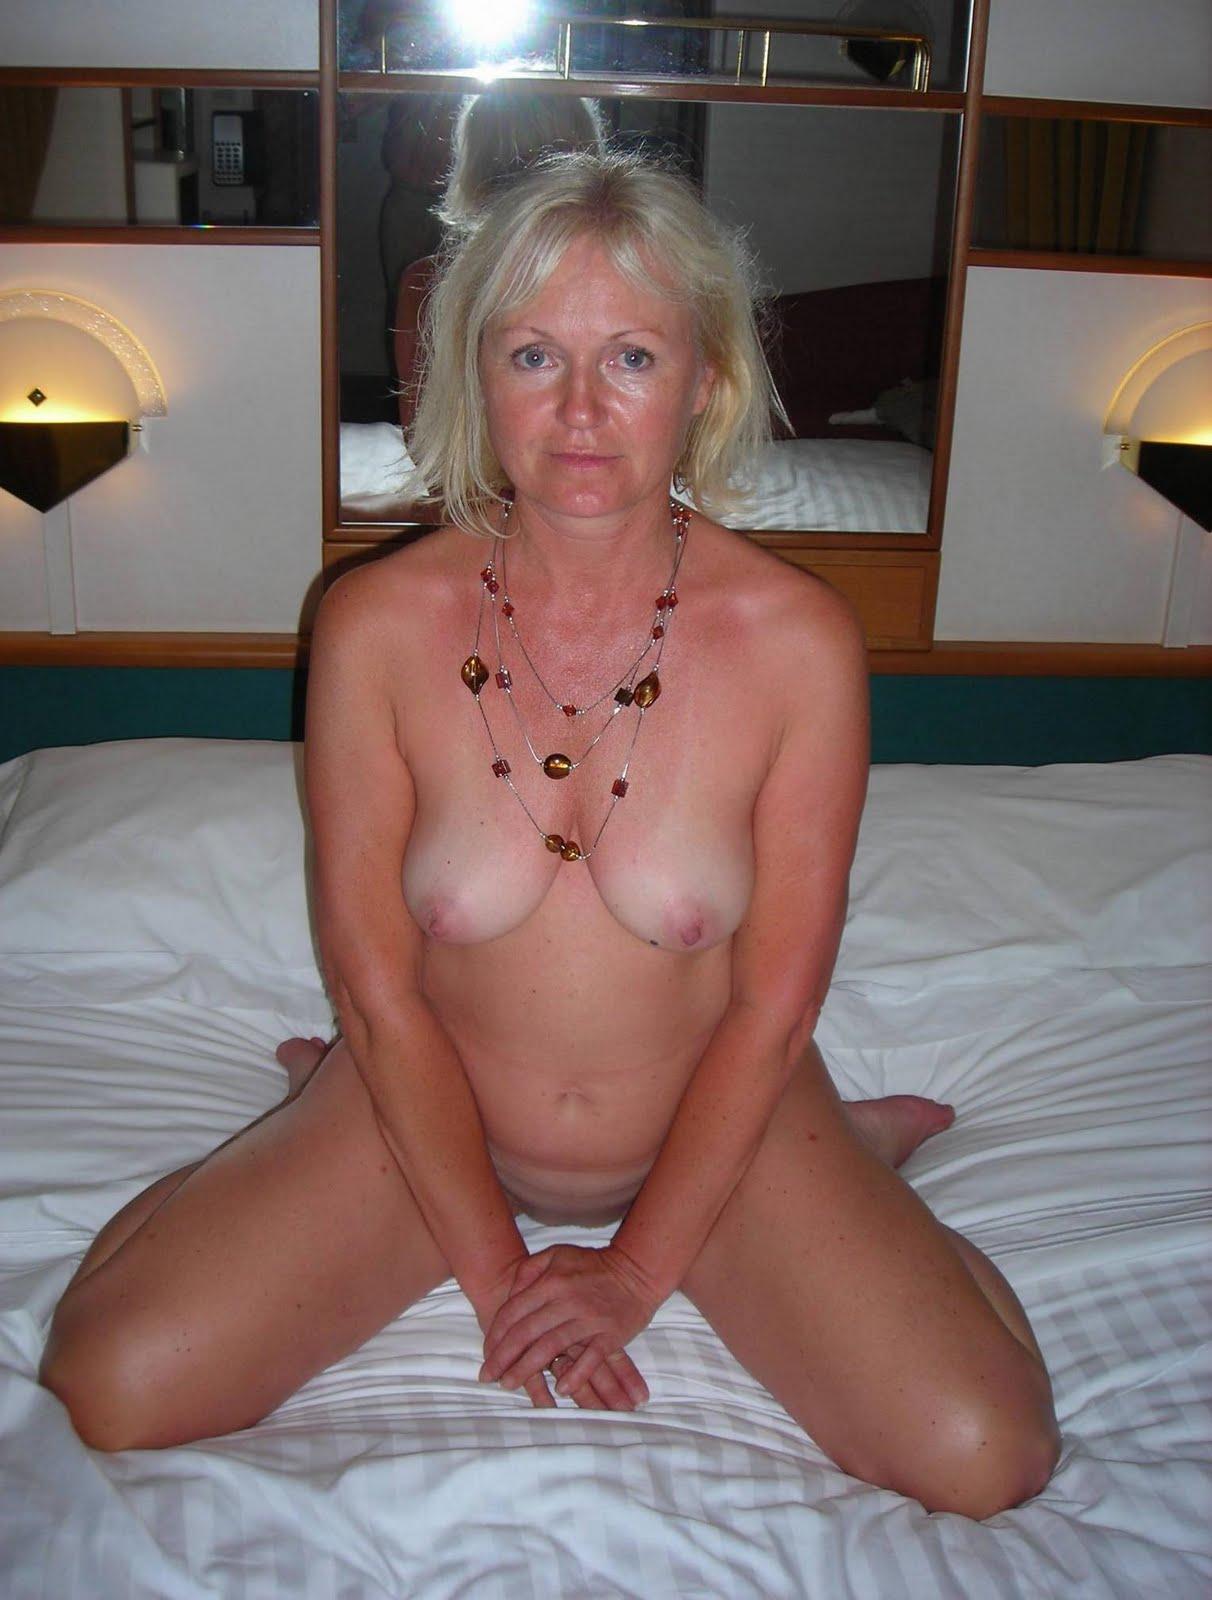 Sunny leone nude image gallery